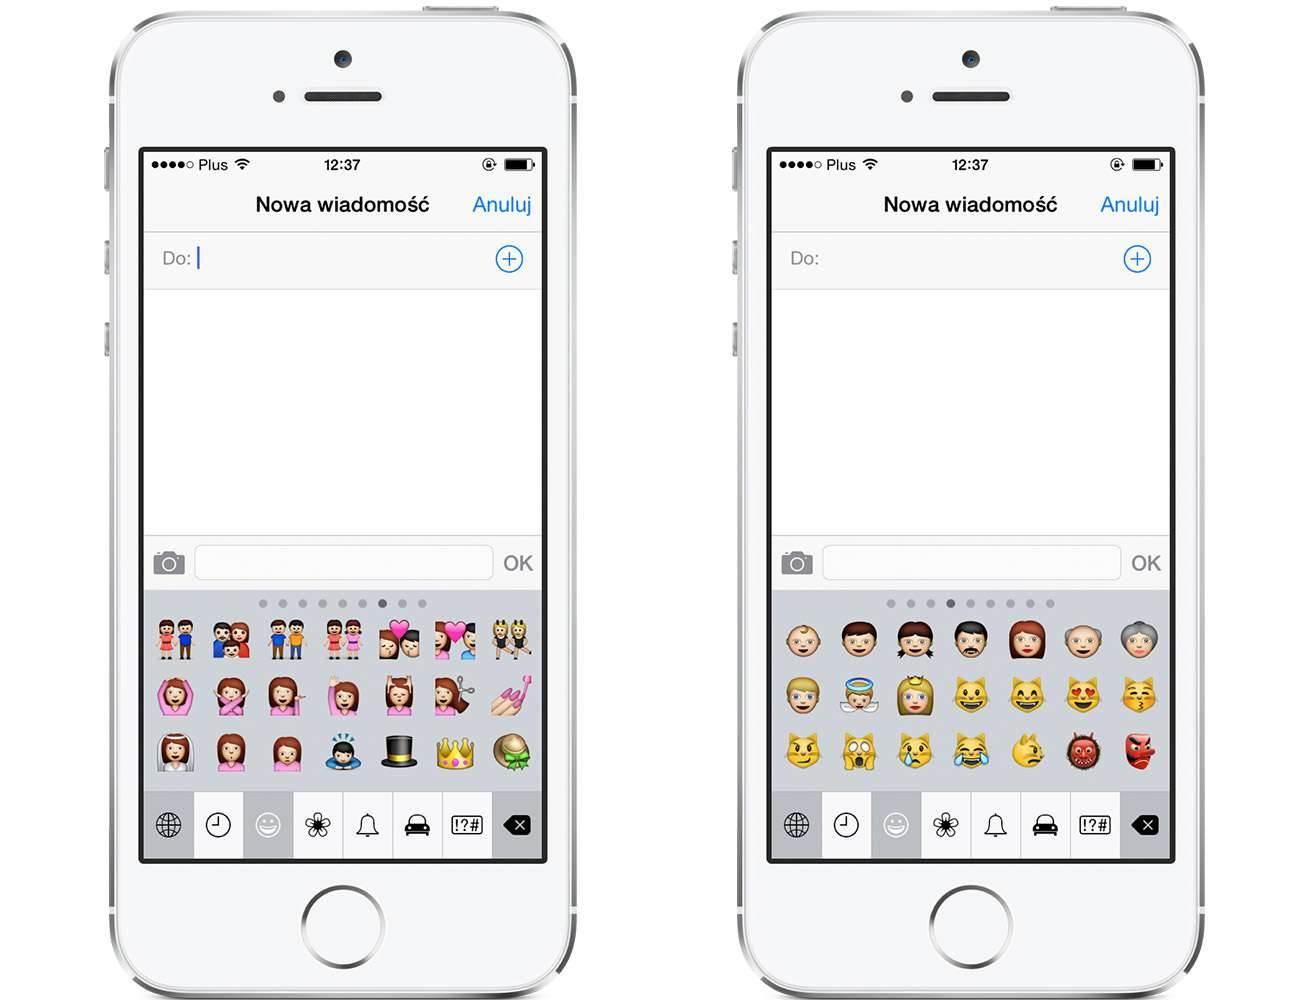 Emoji.onetech.pl